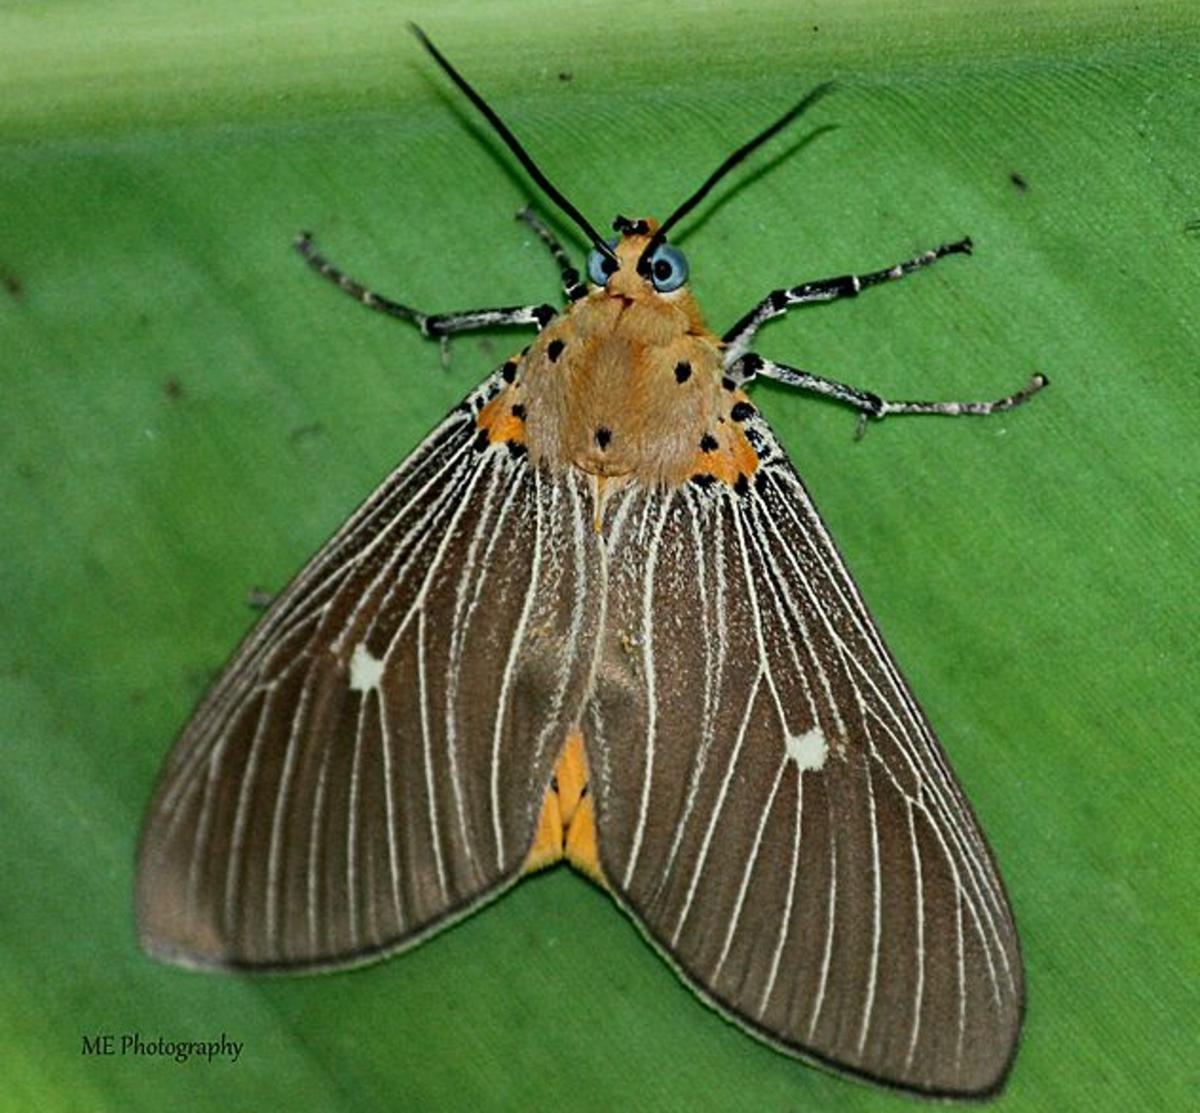 Adult Asota caricae tiger moth